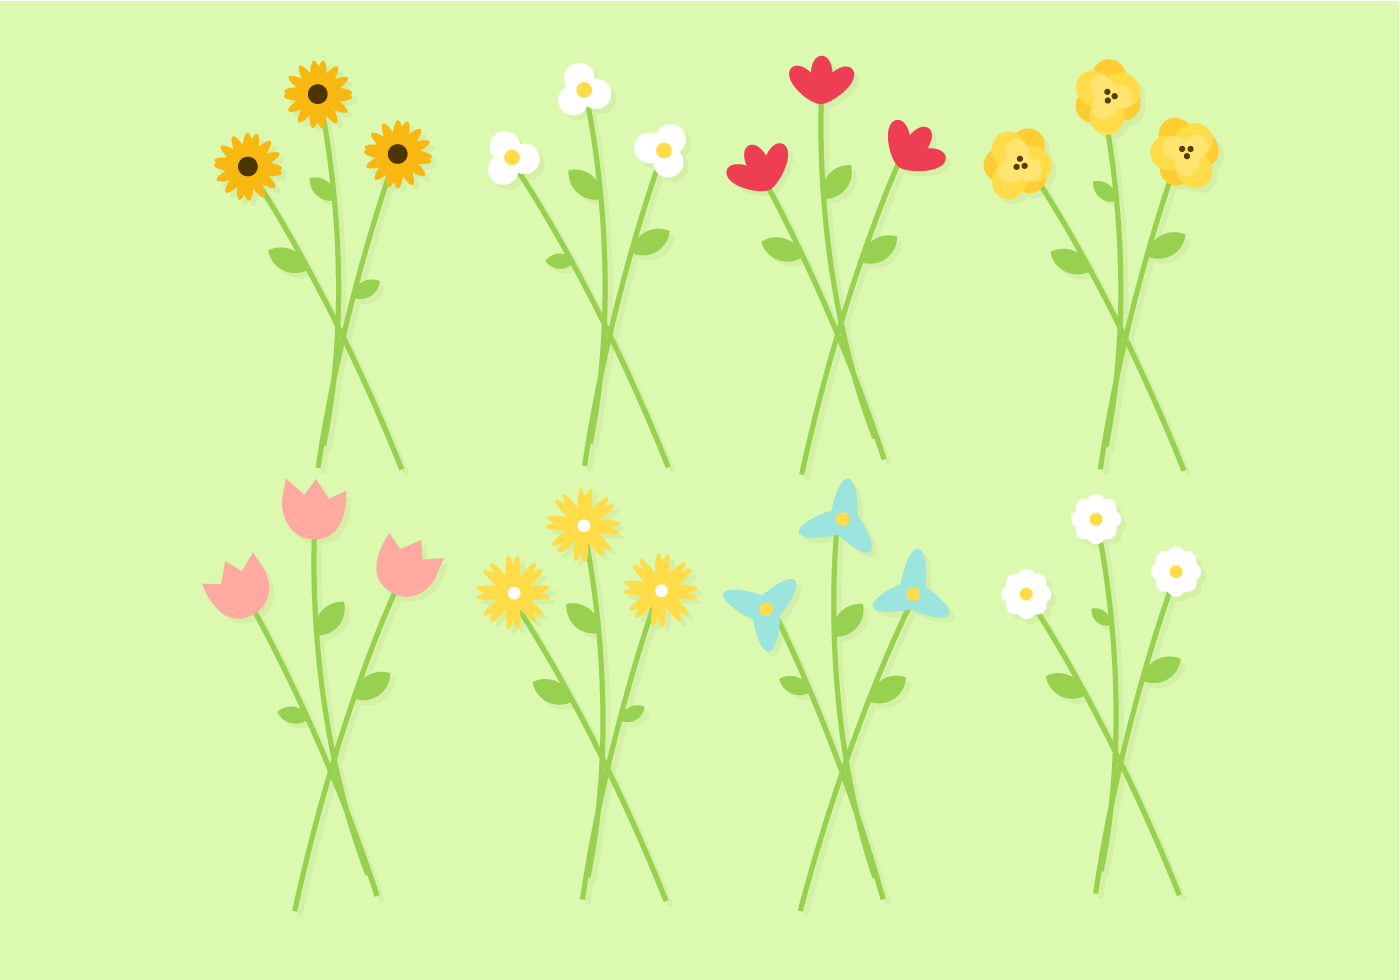 Bouquet of flowers vector download free vector art stock graphics bouquet of flowers vector download free vector art stock graphics images izmirmasajfo Gallery